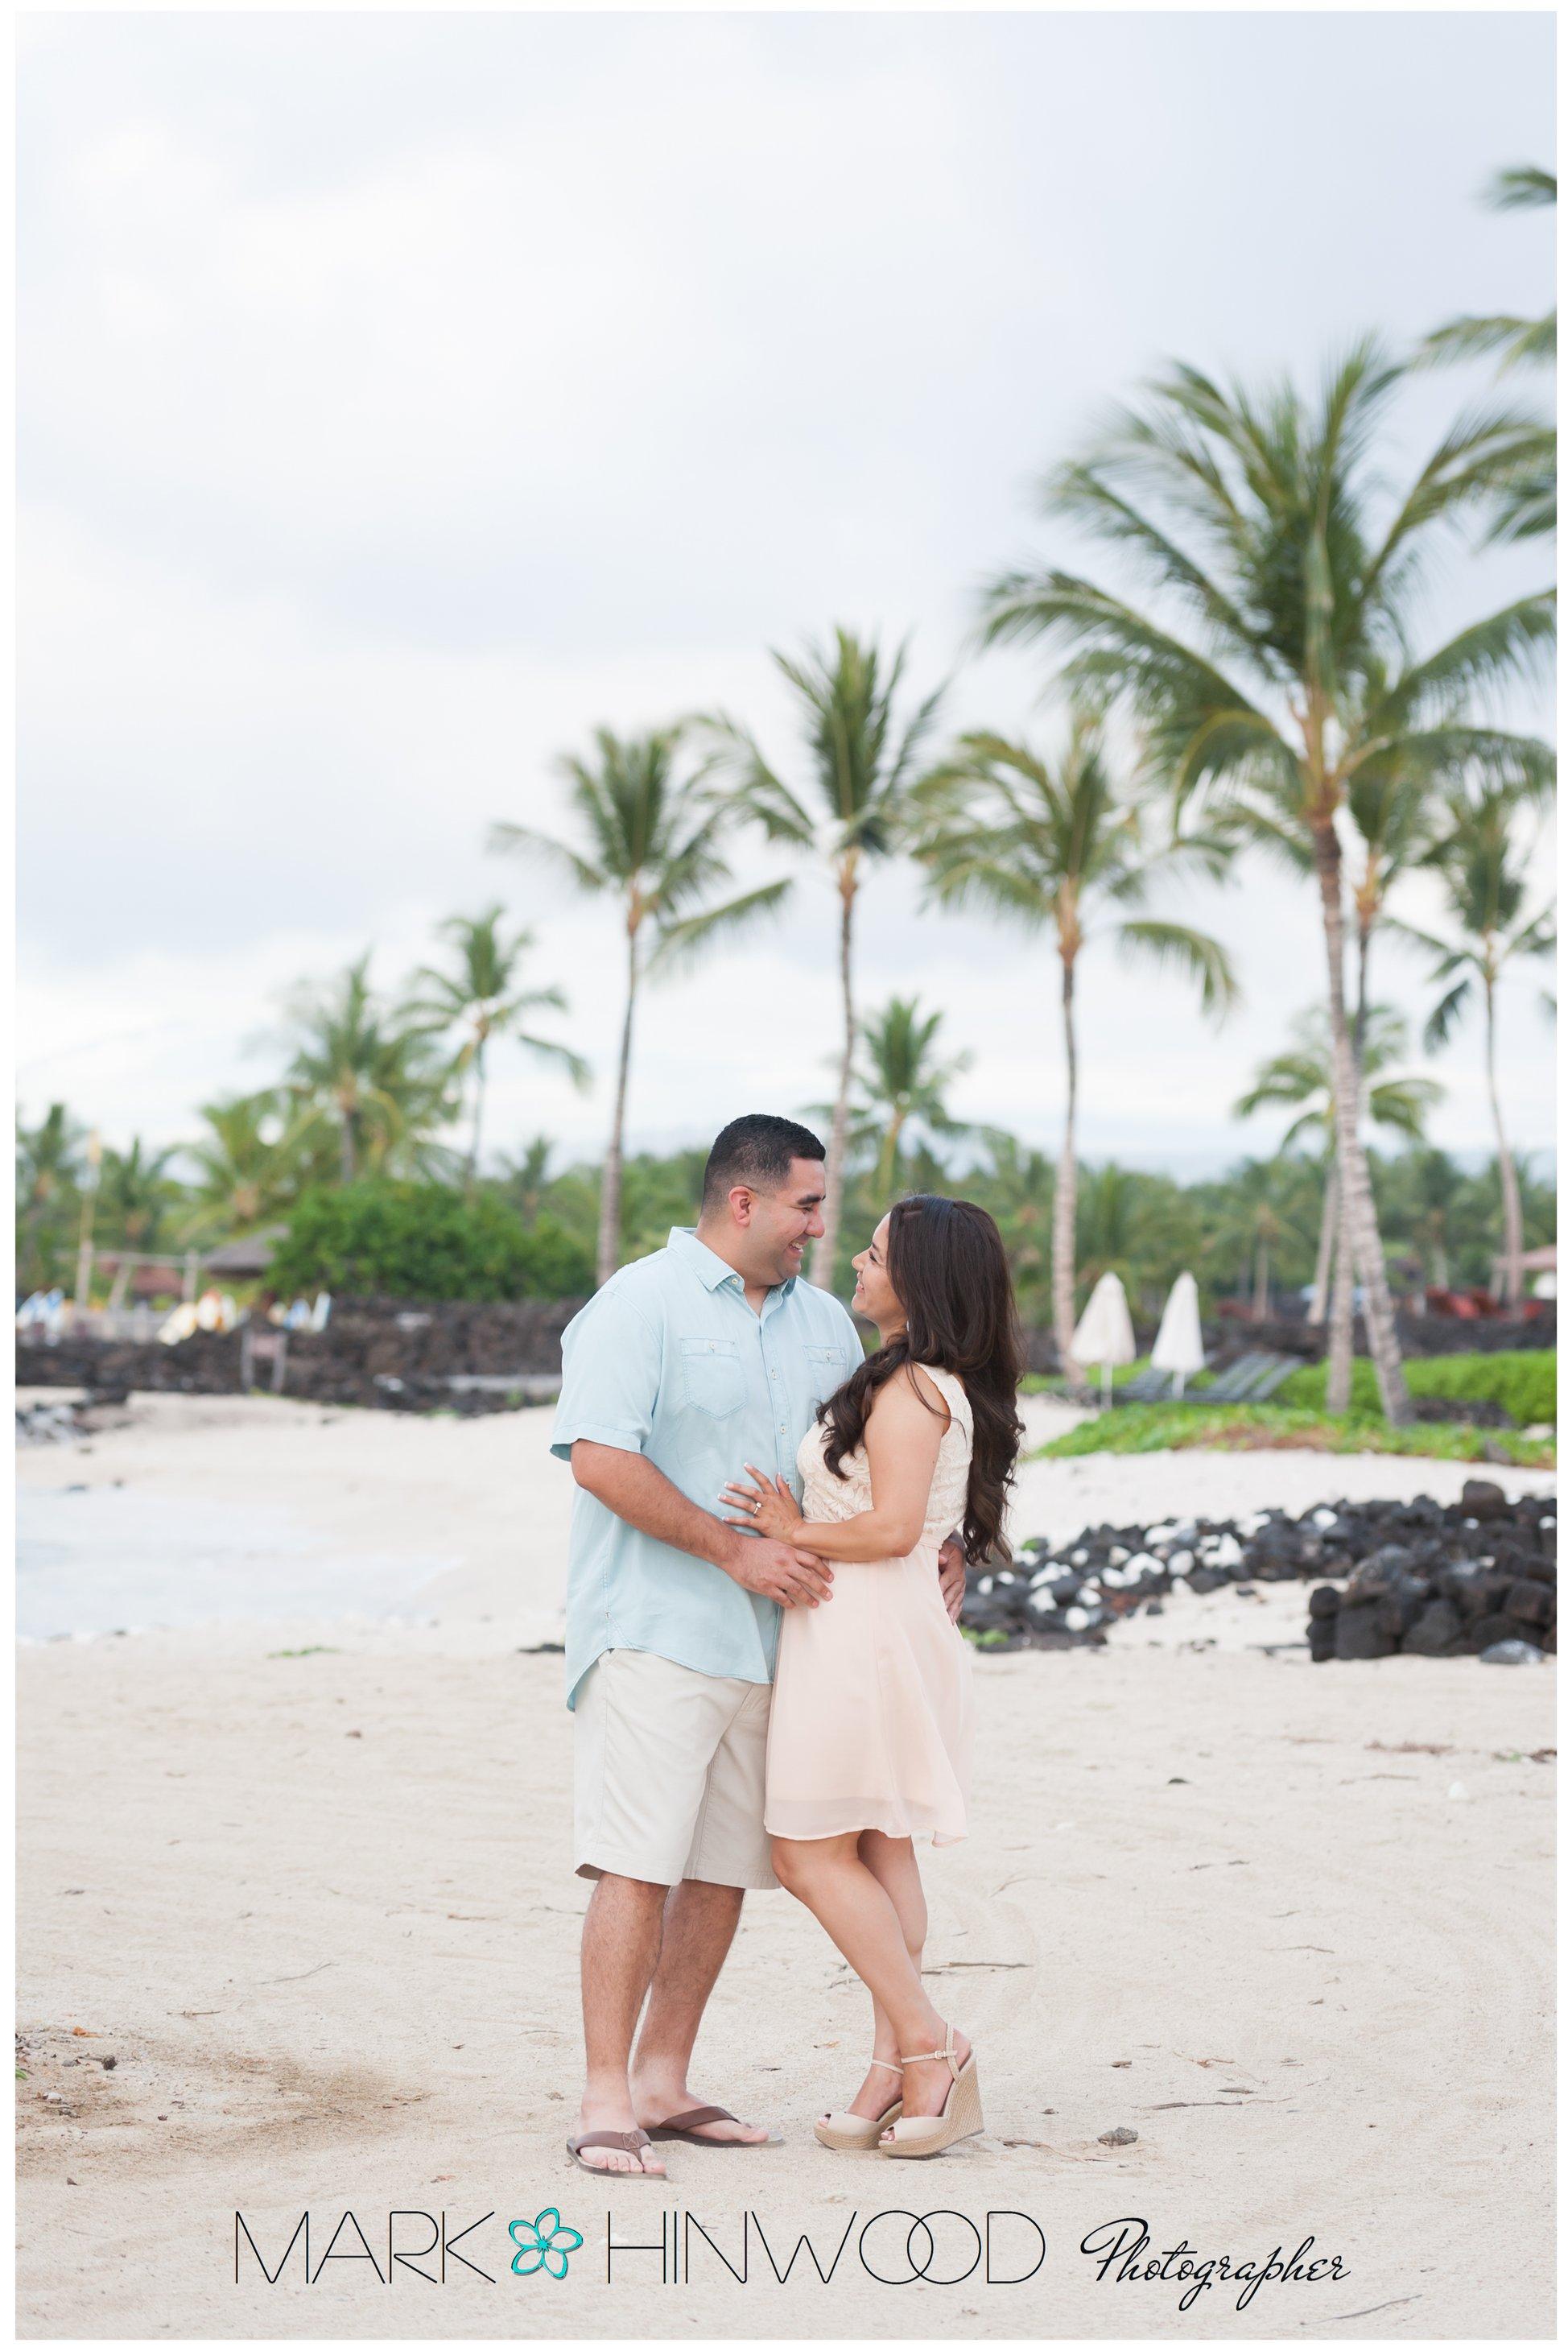 Hawaii engagment photography 5